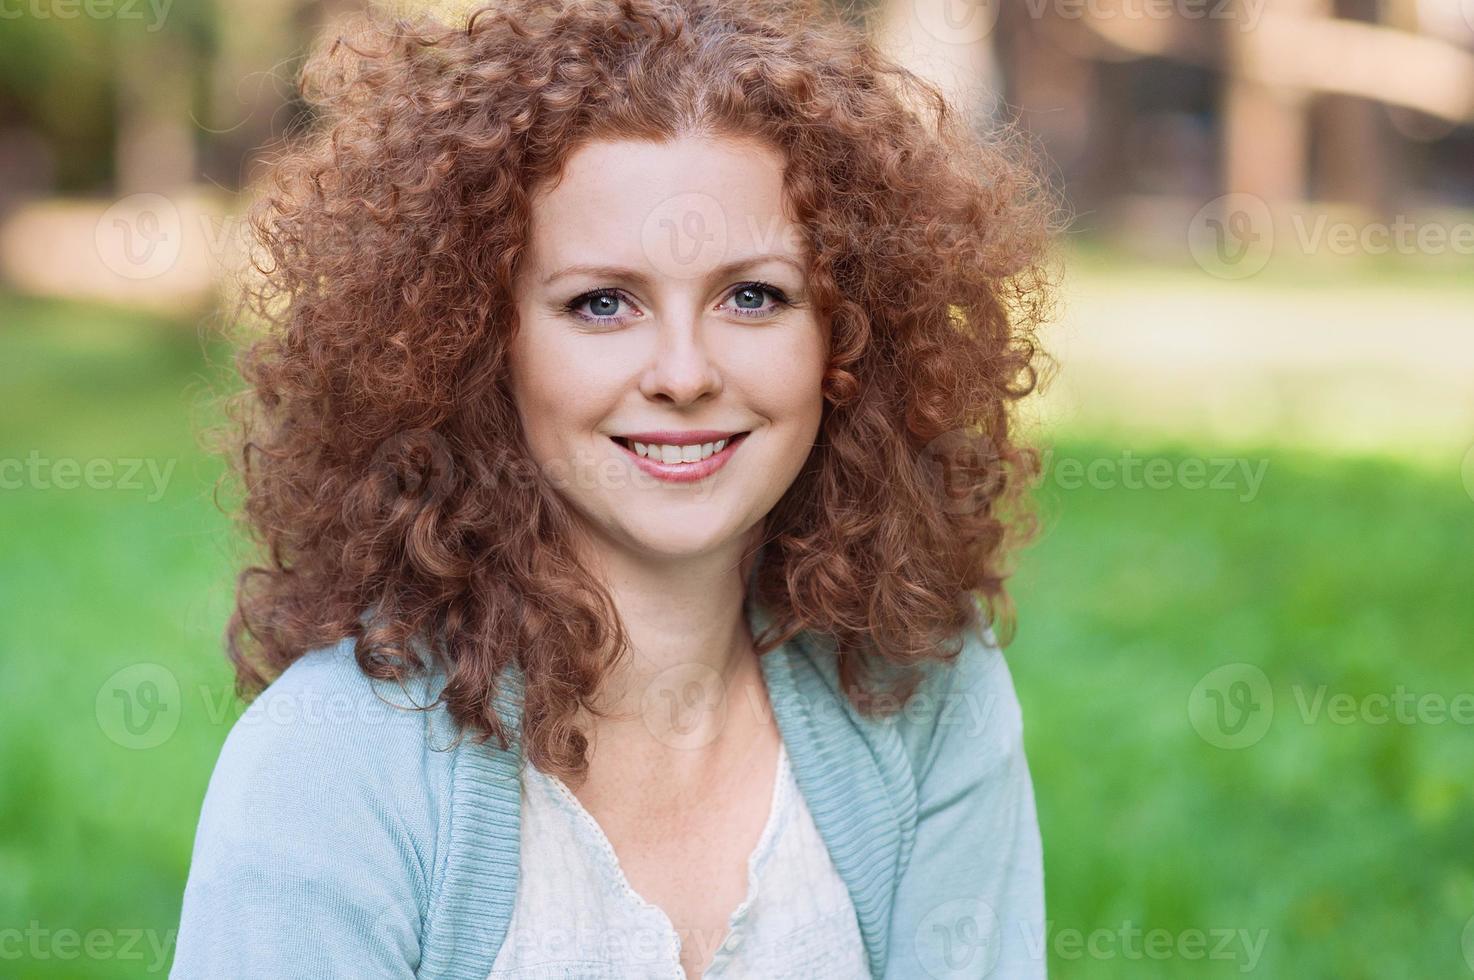 sorridente giovane donna all'aperto foto